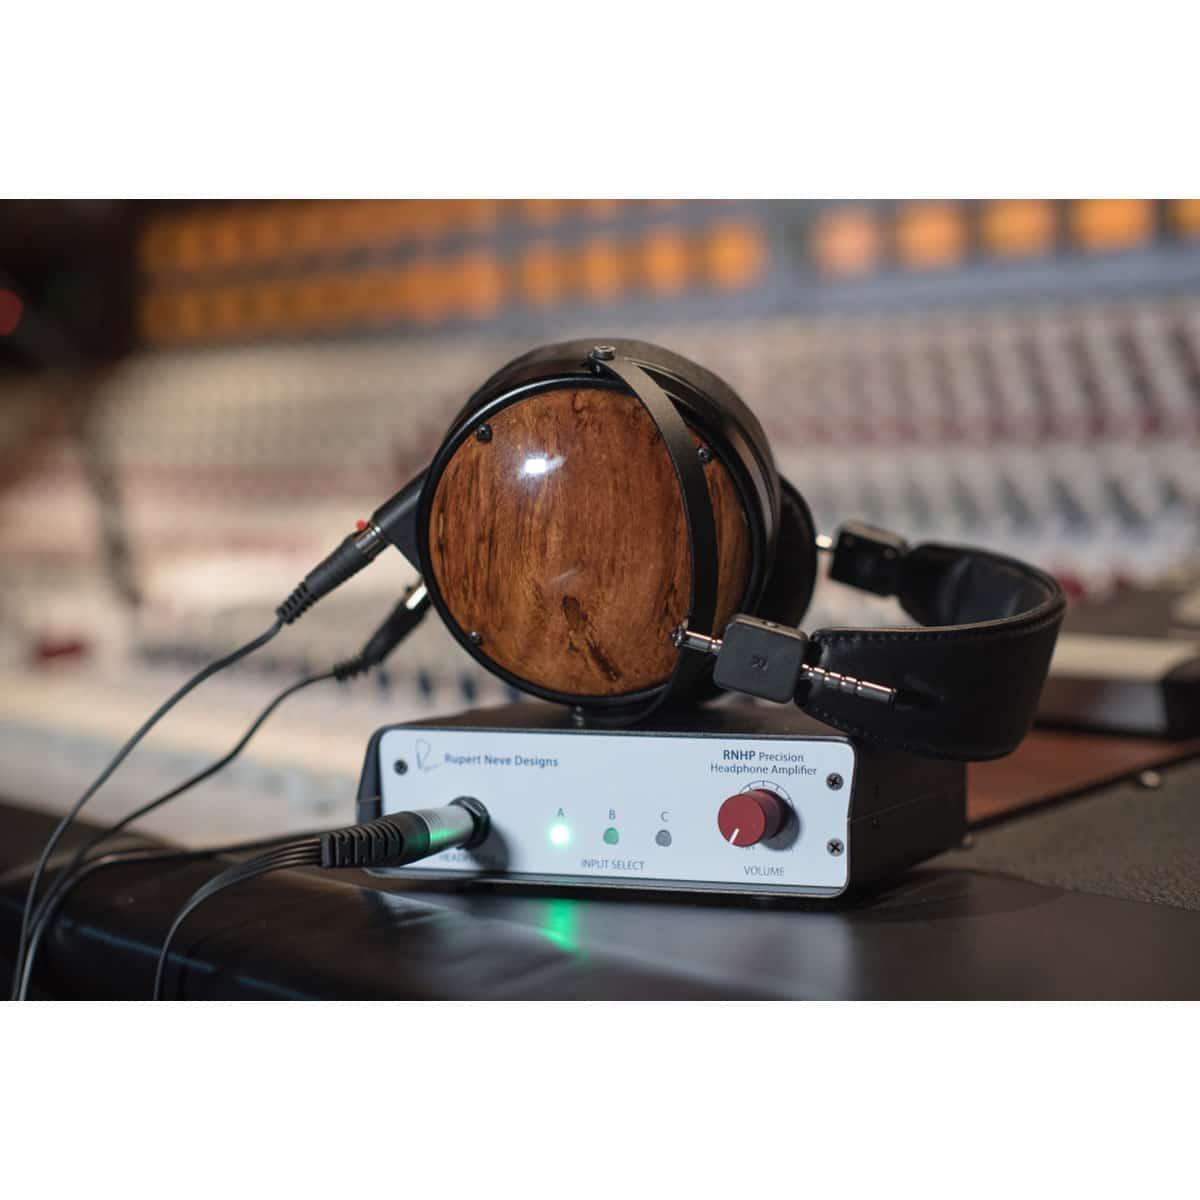 Rupert Neve RNHP 05 Amplificatori di potenza e amplificatori cuffie, Pro Audio, Audio Monitors, Cuffie